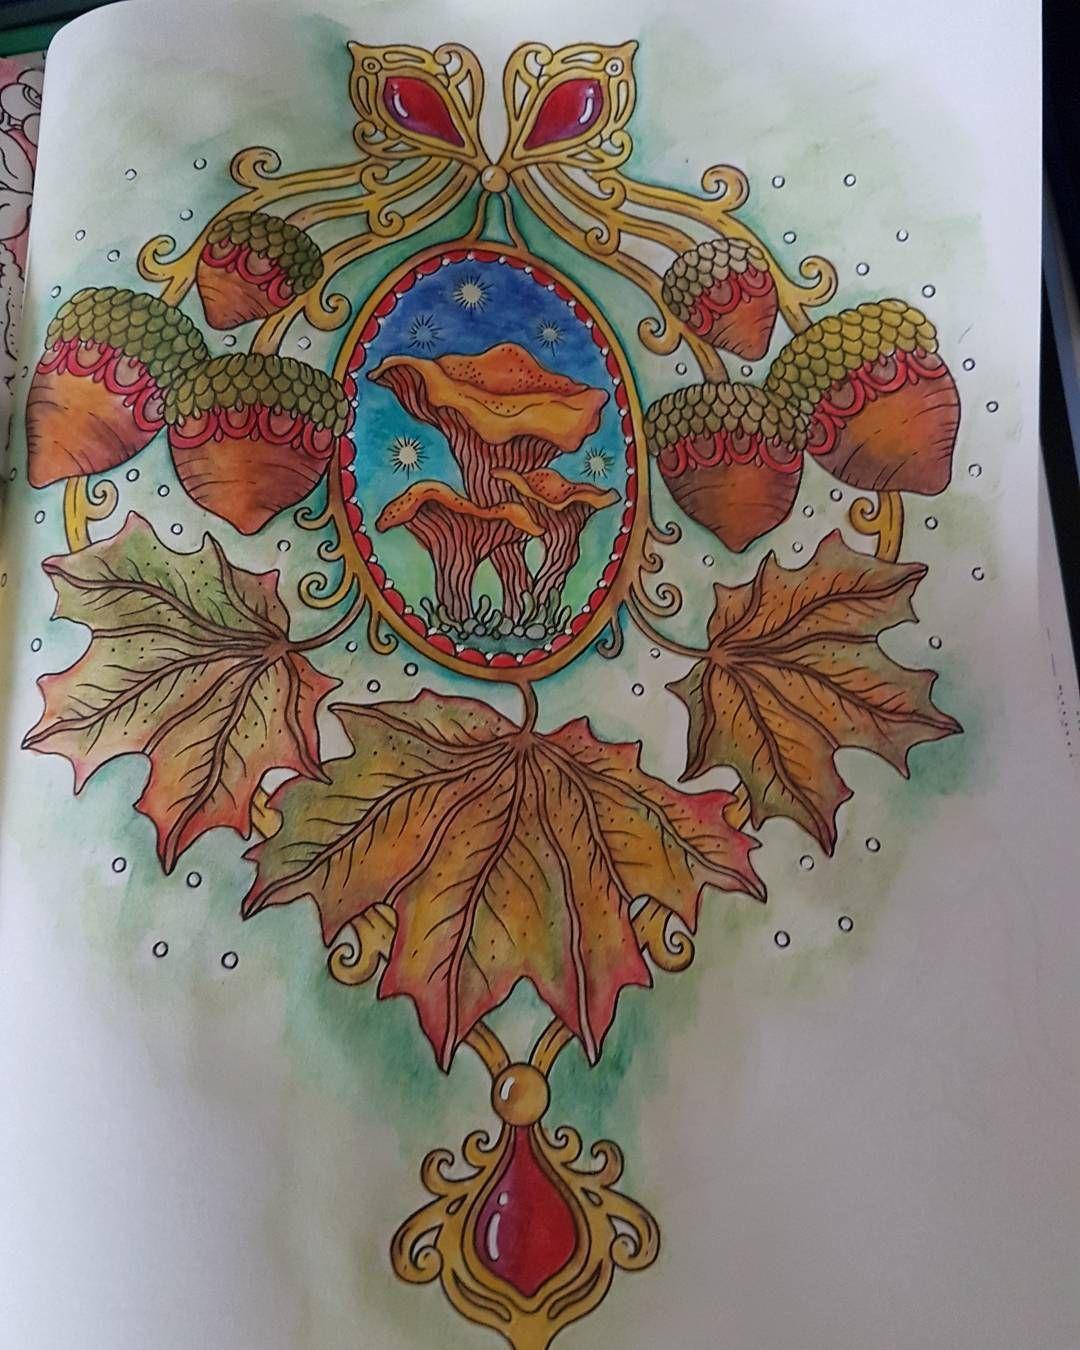 From seasons by Hanna karlzon using caran d ache supracolour pencils   #supracolour #hannakarlzon #seasons #pencils #watercolours #adultcolouring #colour #colouring #colouringpencils #colouringbook #carandache #posca